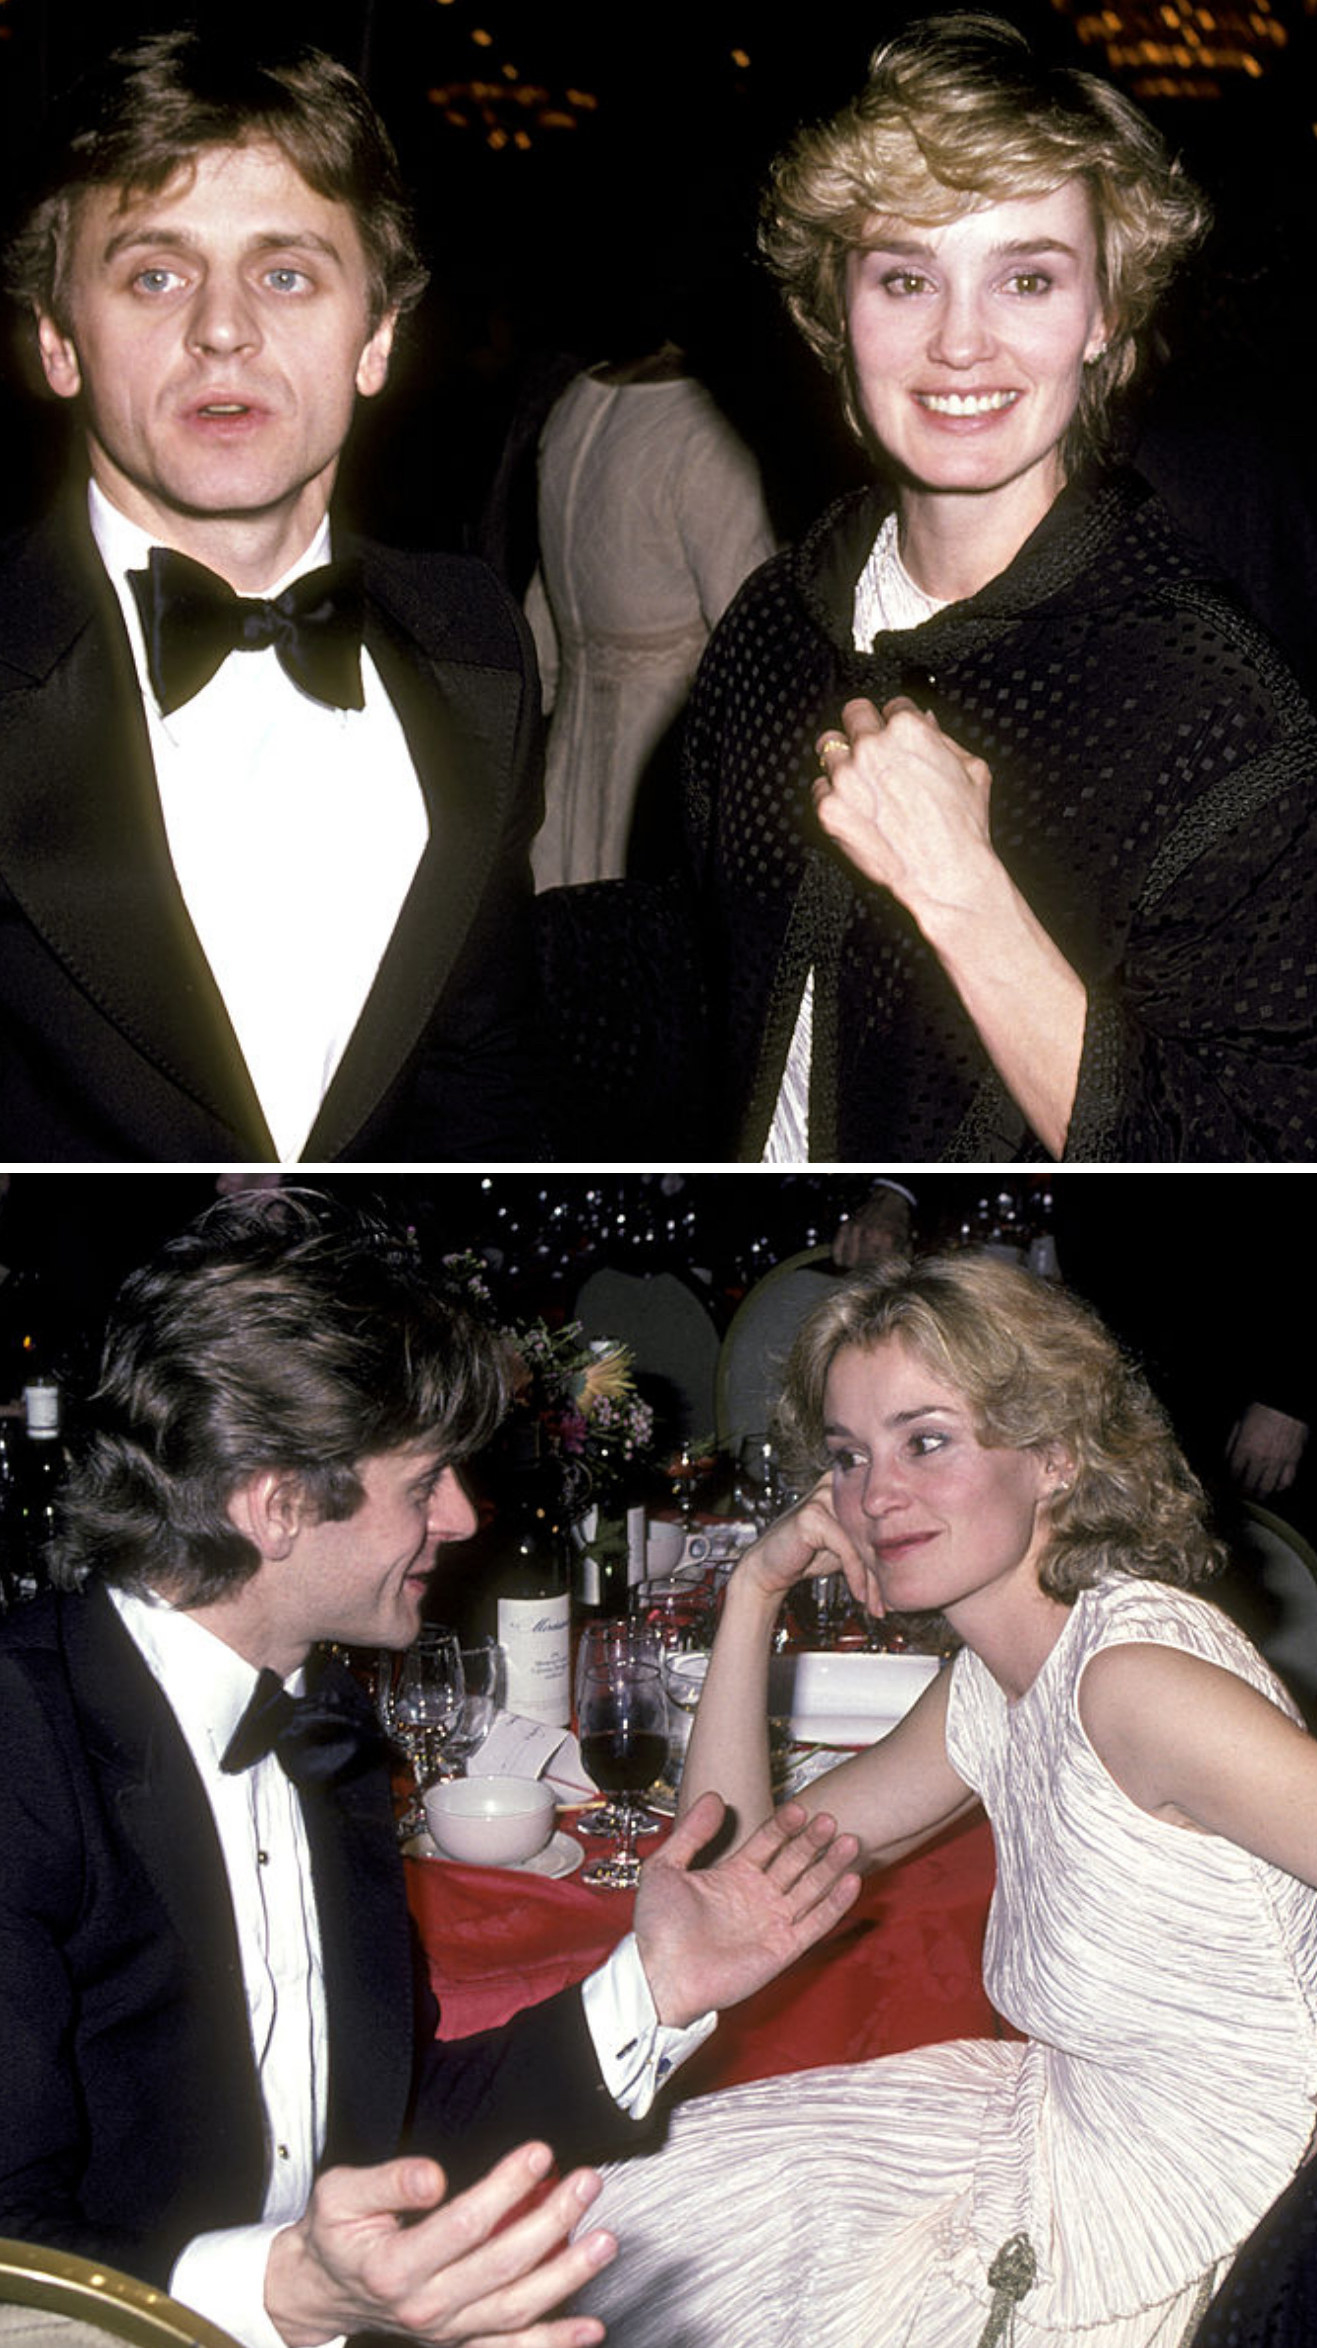 Lange andBaryshnikov at an event in 1983; Lange and Baryshnikov at an AFI Life Achievement Awards dinner in 1982